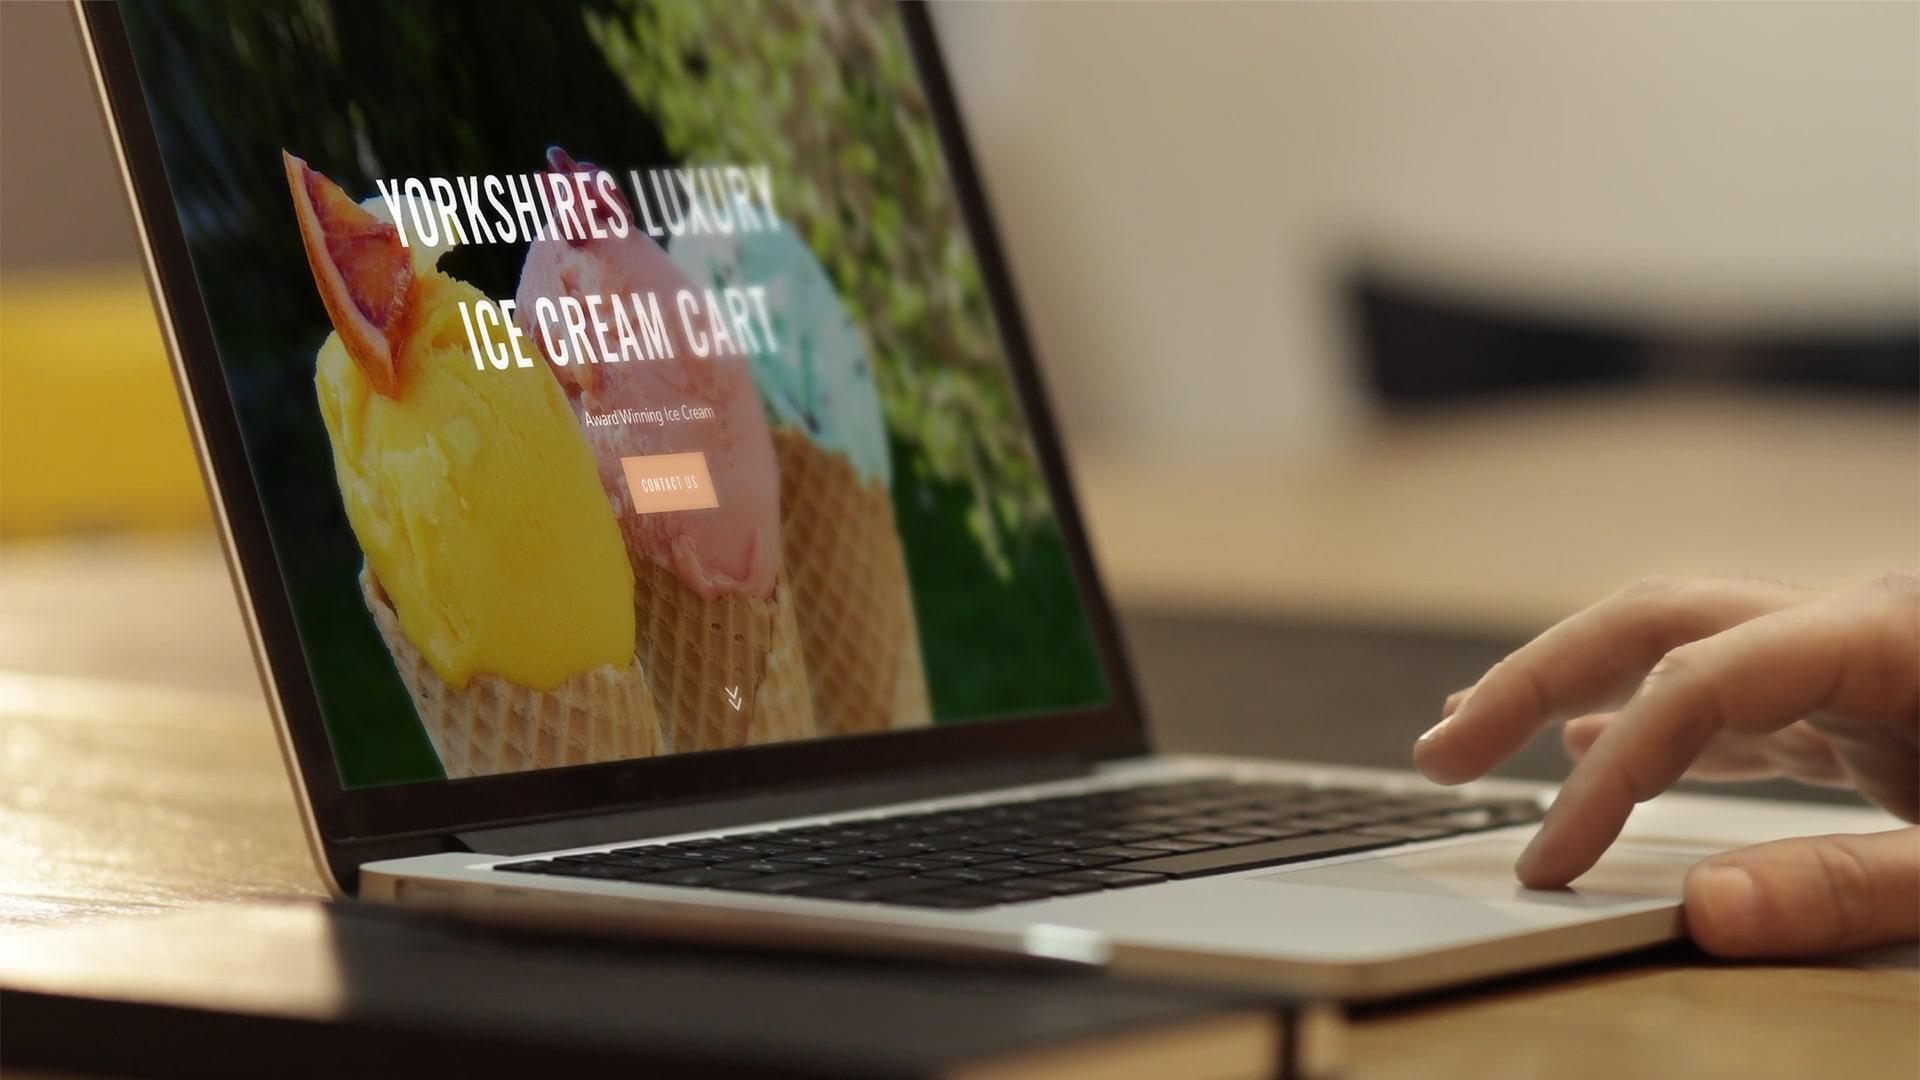 Yorkshire's Luxury Ice Cream Cart WordPress Website